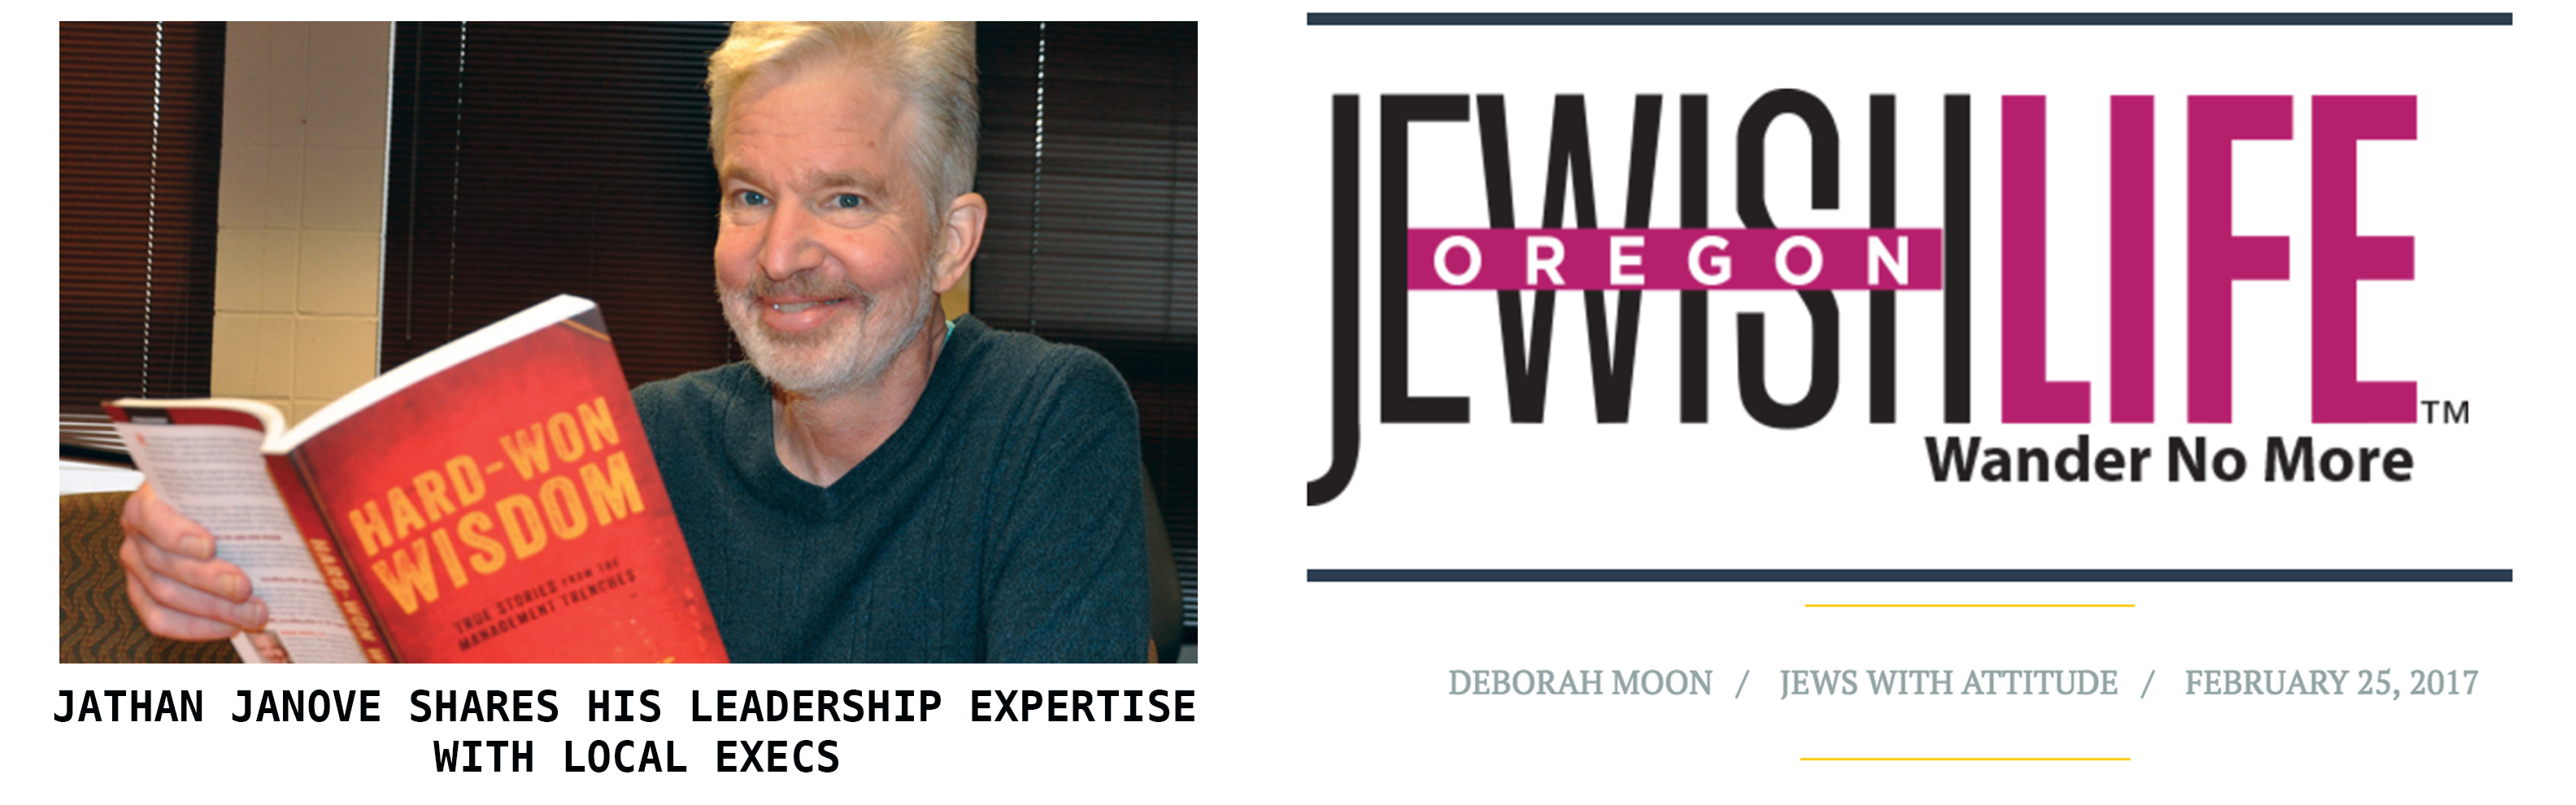 OR Jewish Life